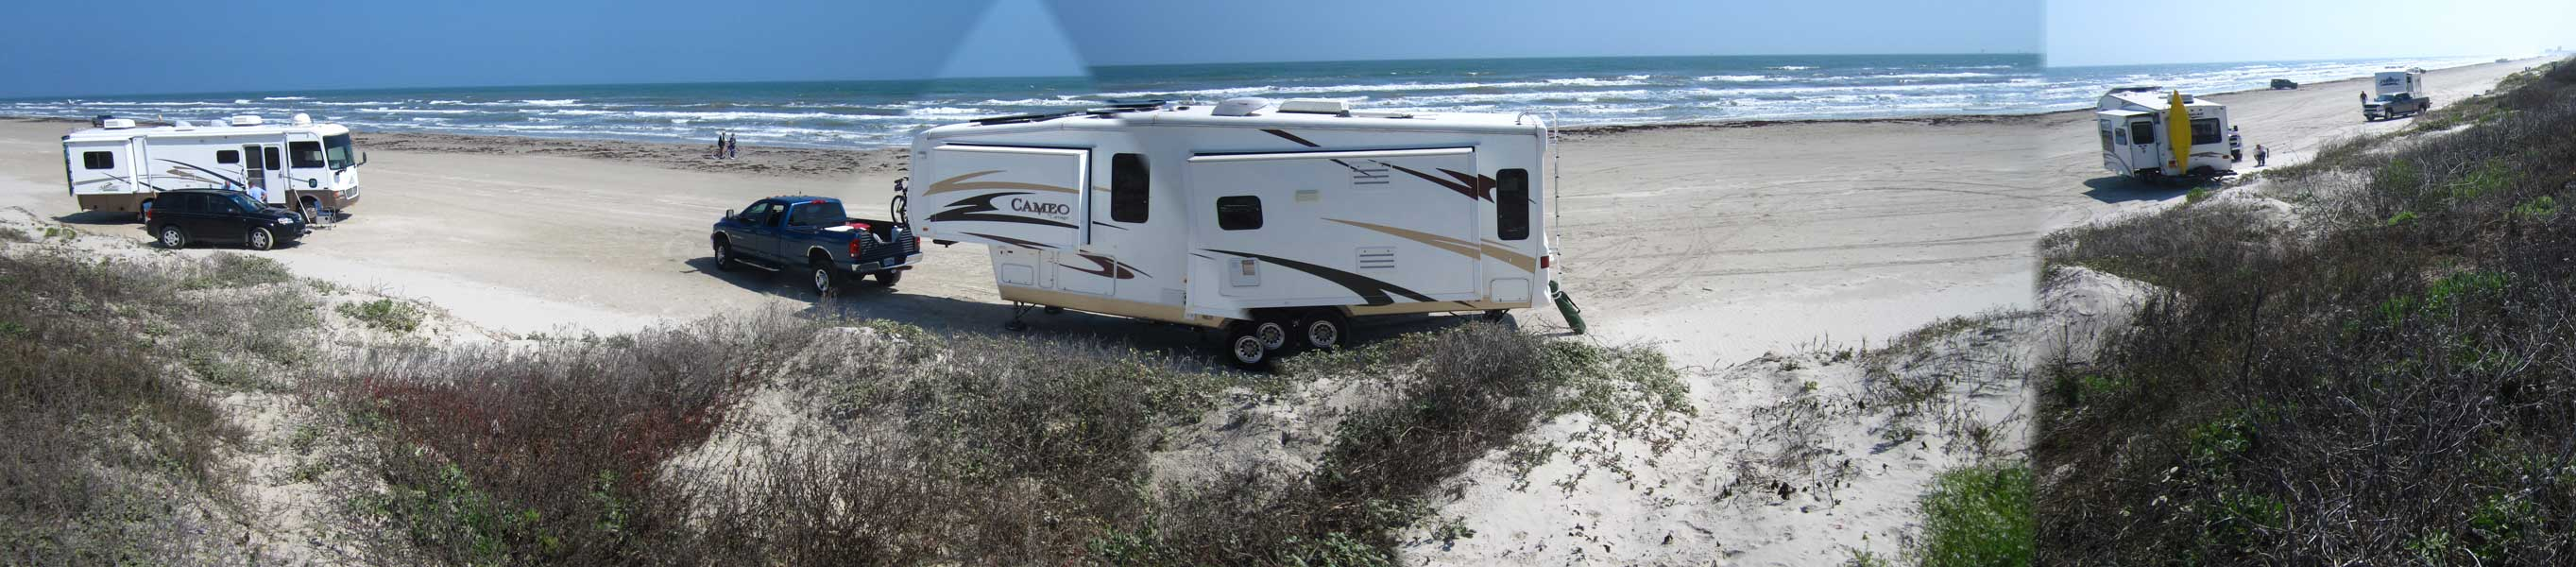 Camping On Port Aransas City Beach